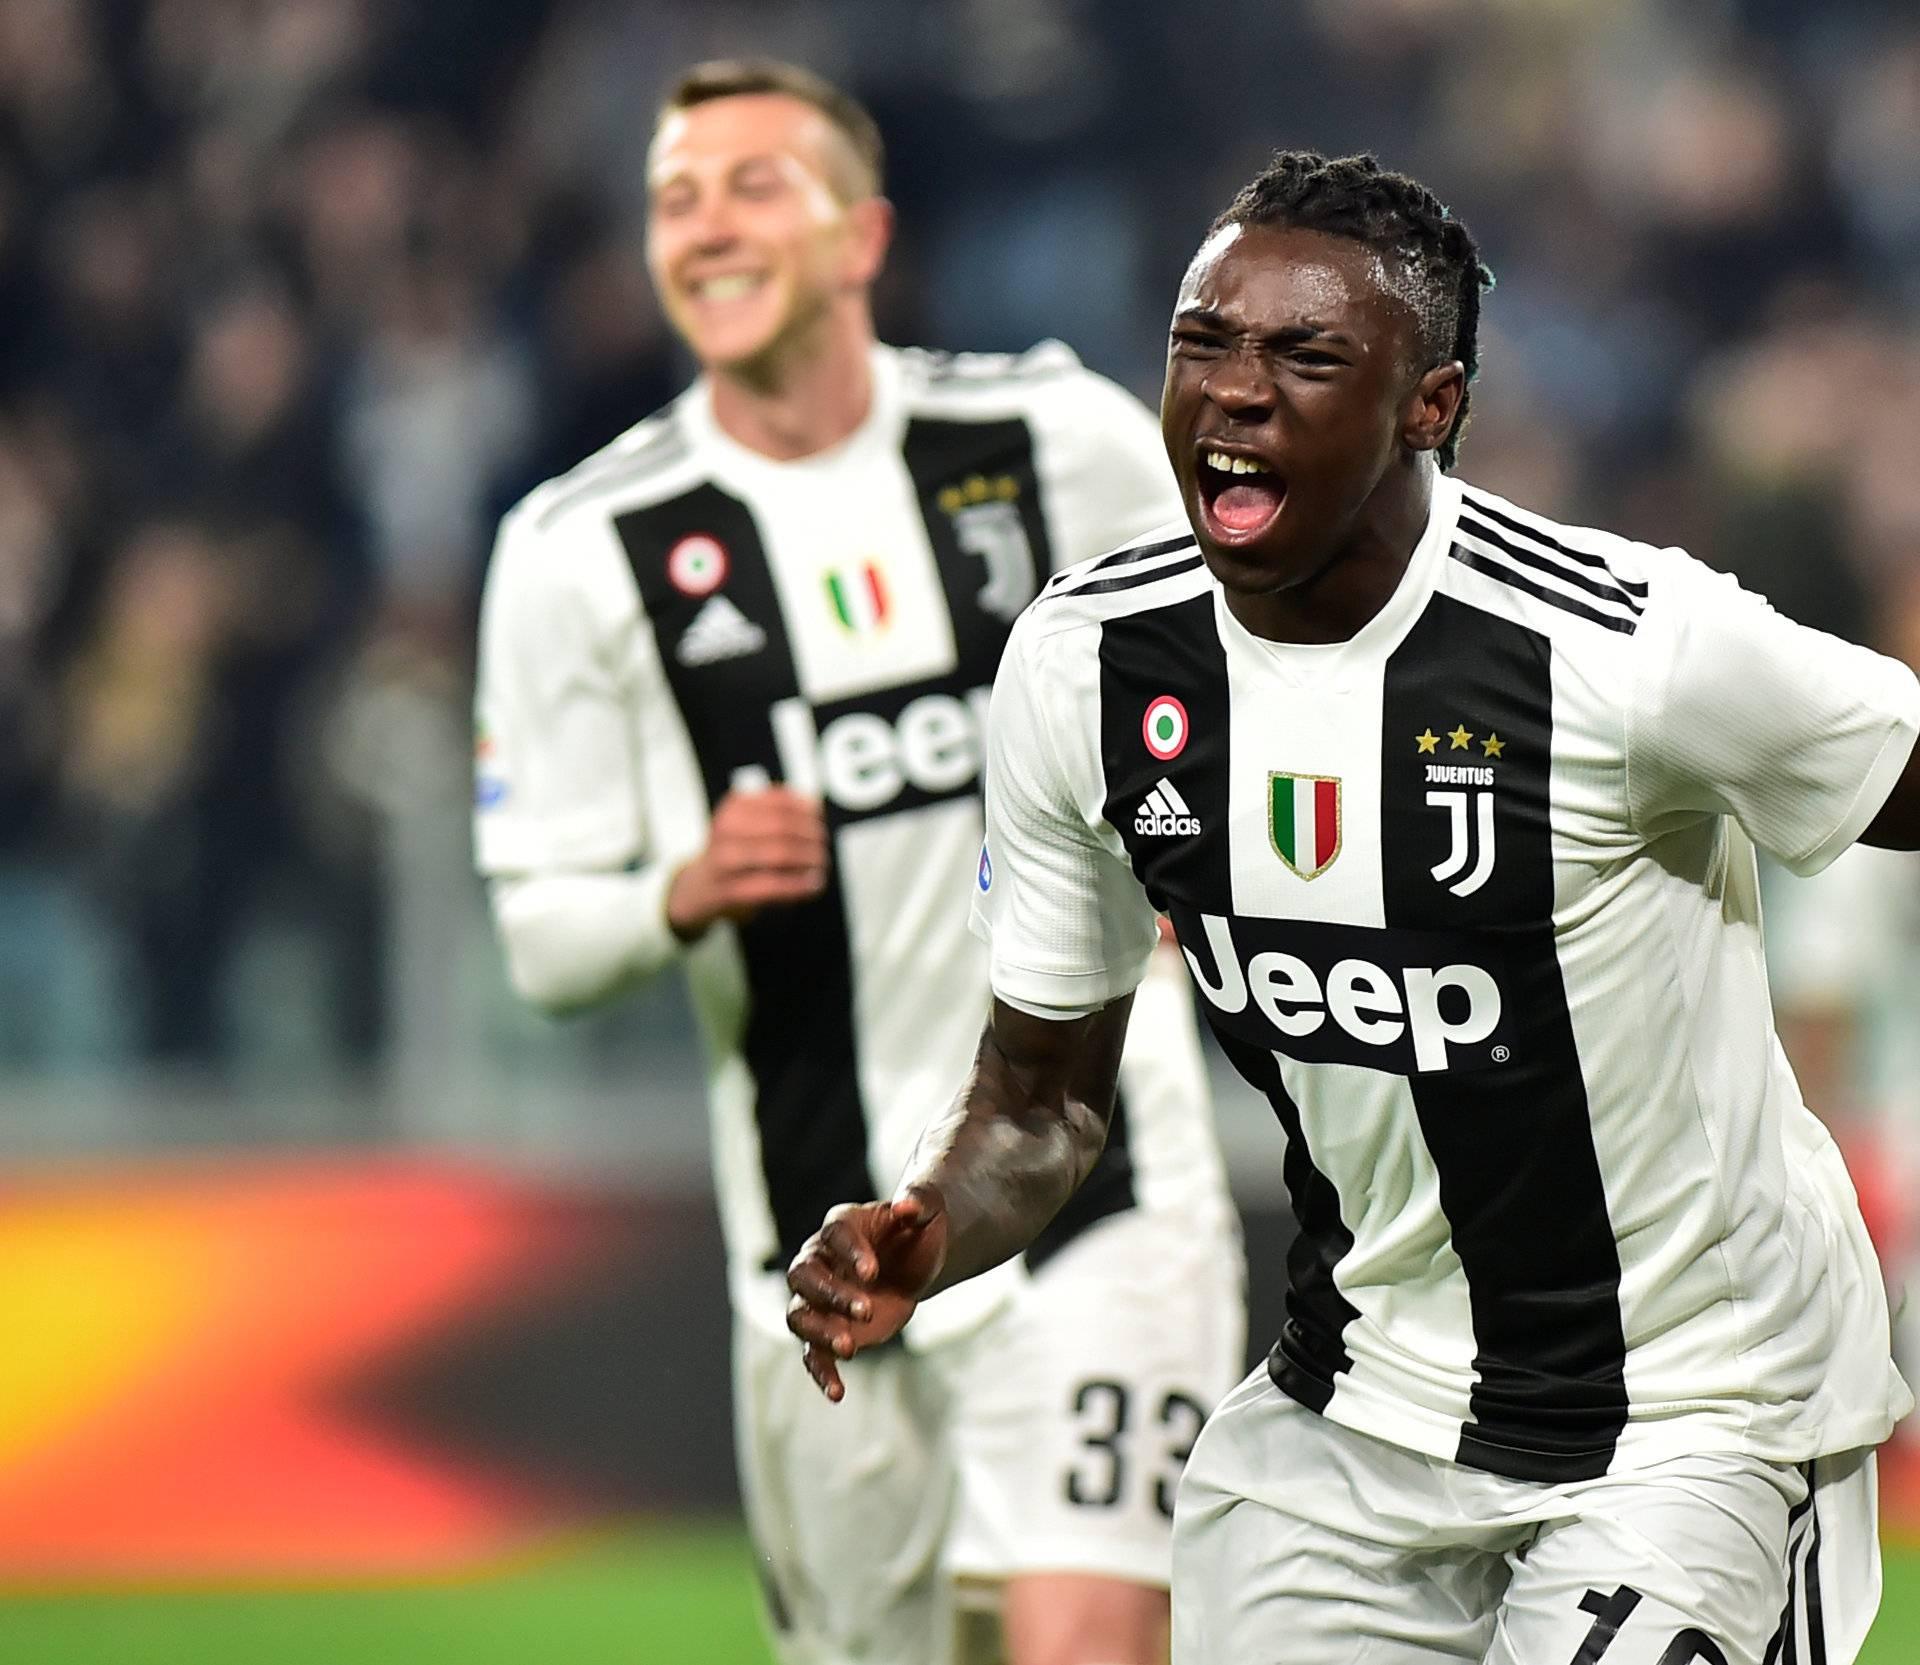 Serie A - Juventus v Udinese